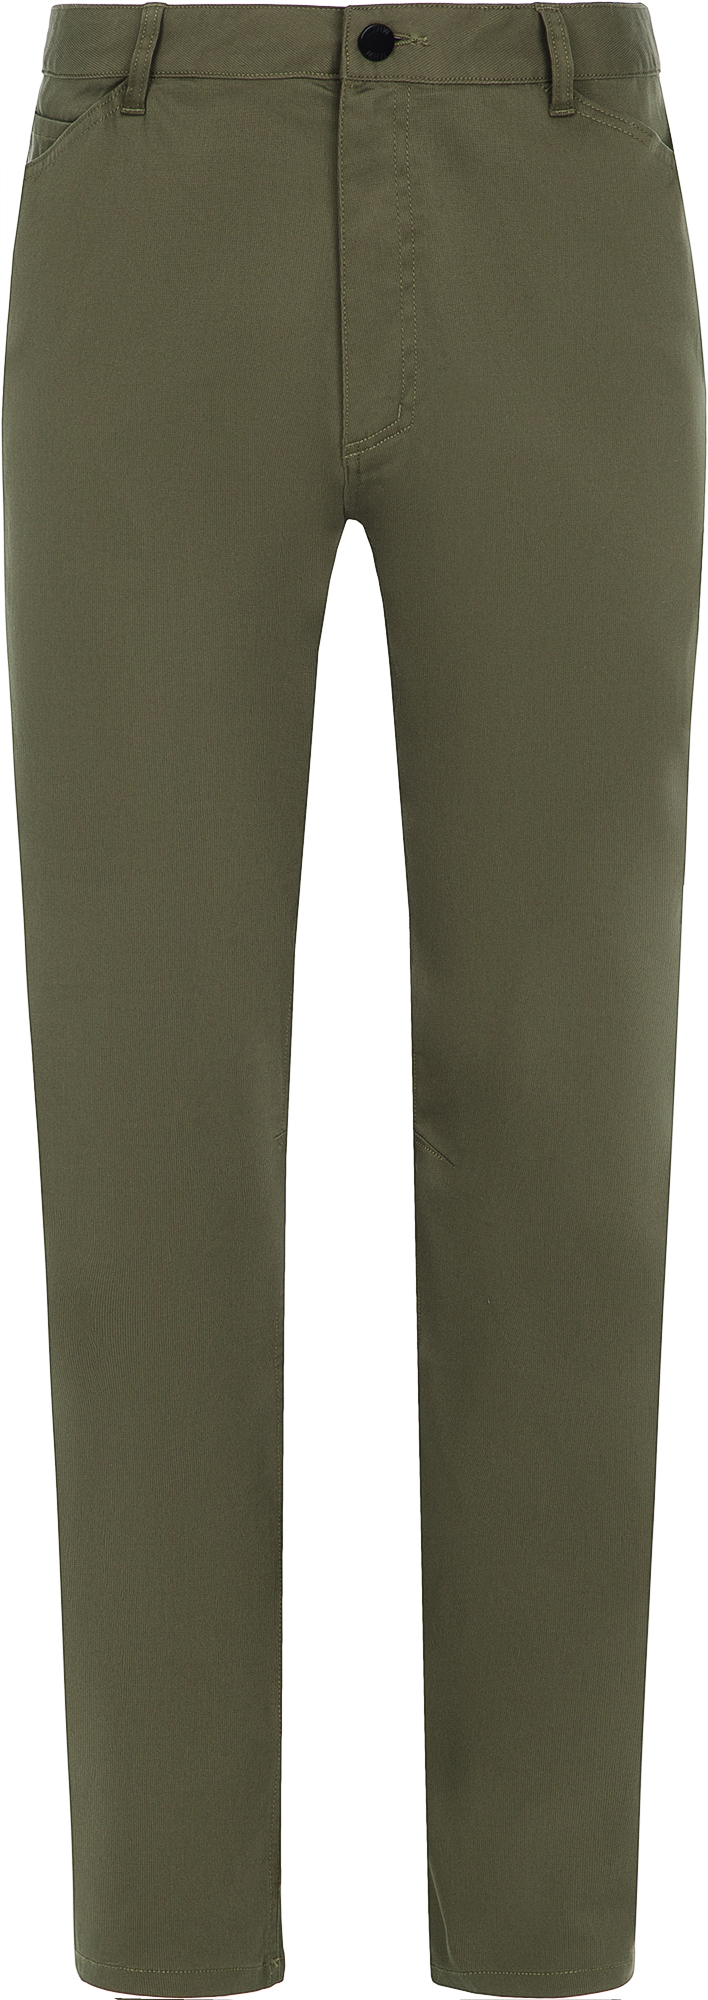 Mountain Hardwear Брюки мужские Mountain Hardwear Kentro Cord™, размер 46